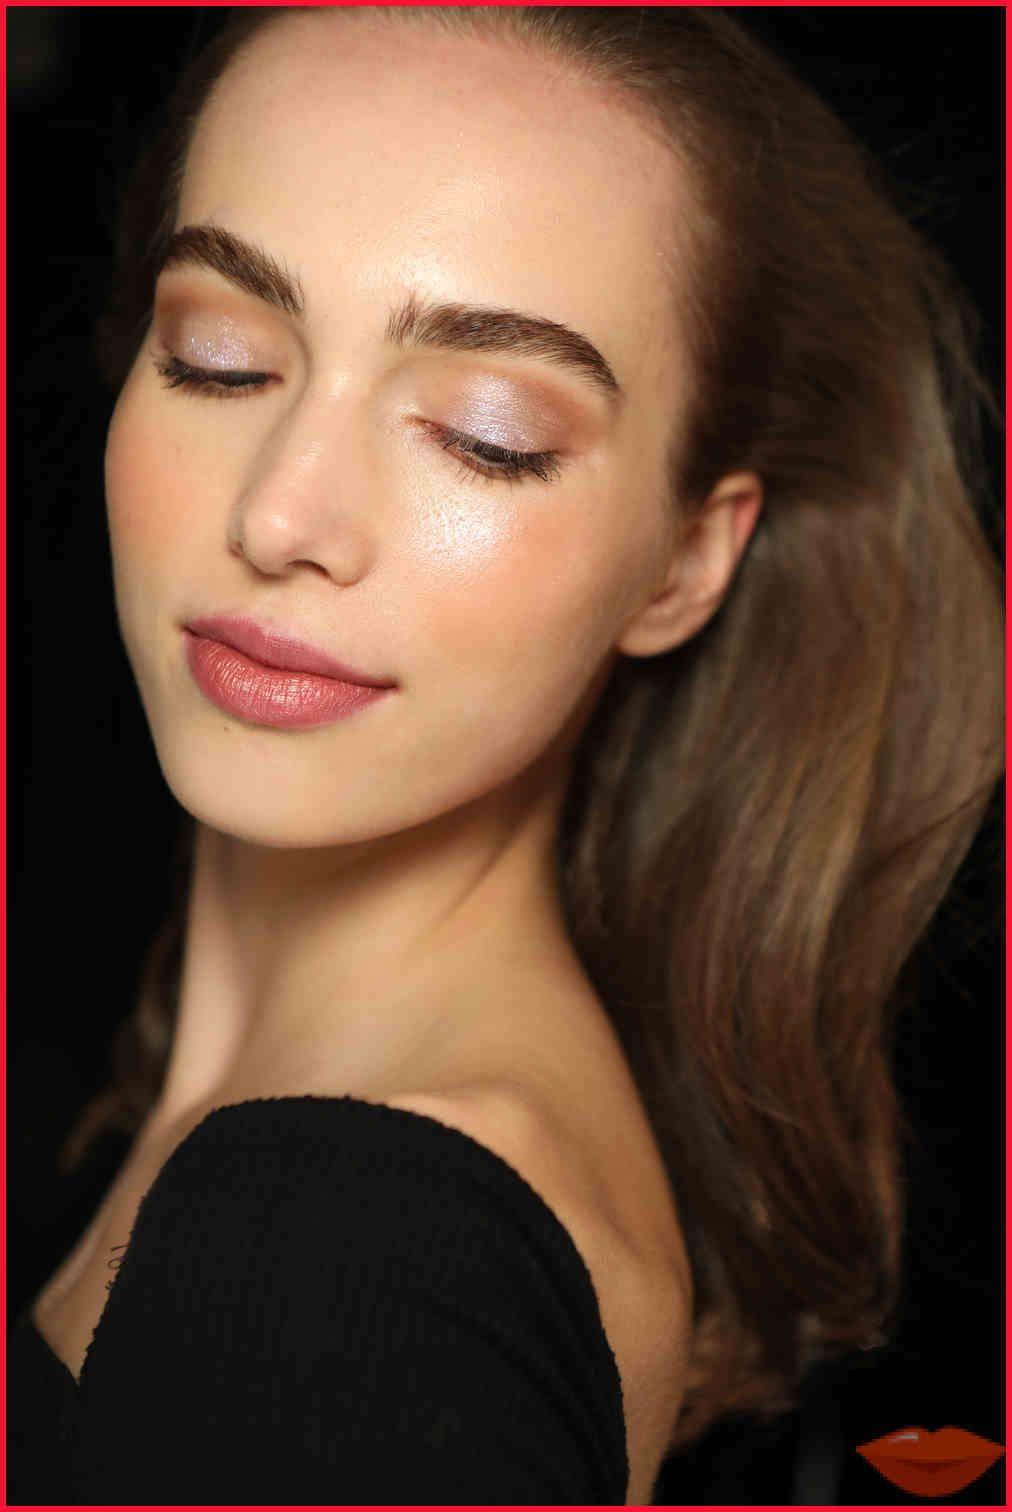 Best Concealer 2020 Review, Best Makeup Trends, Looks, 2018, 2019, 2020: Natural